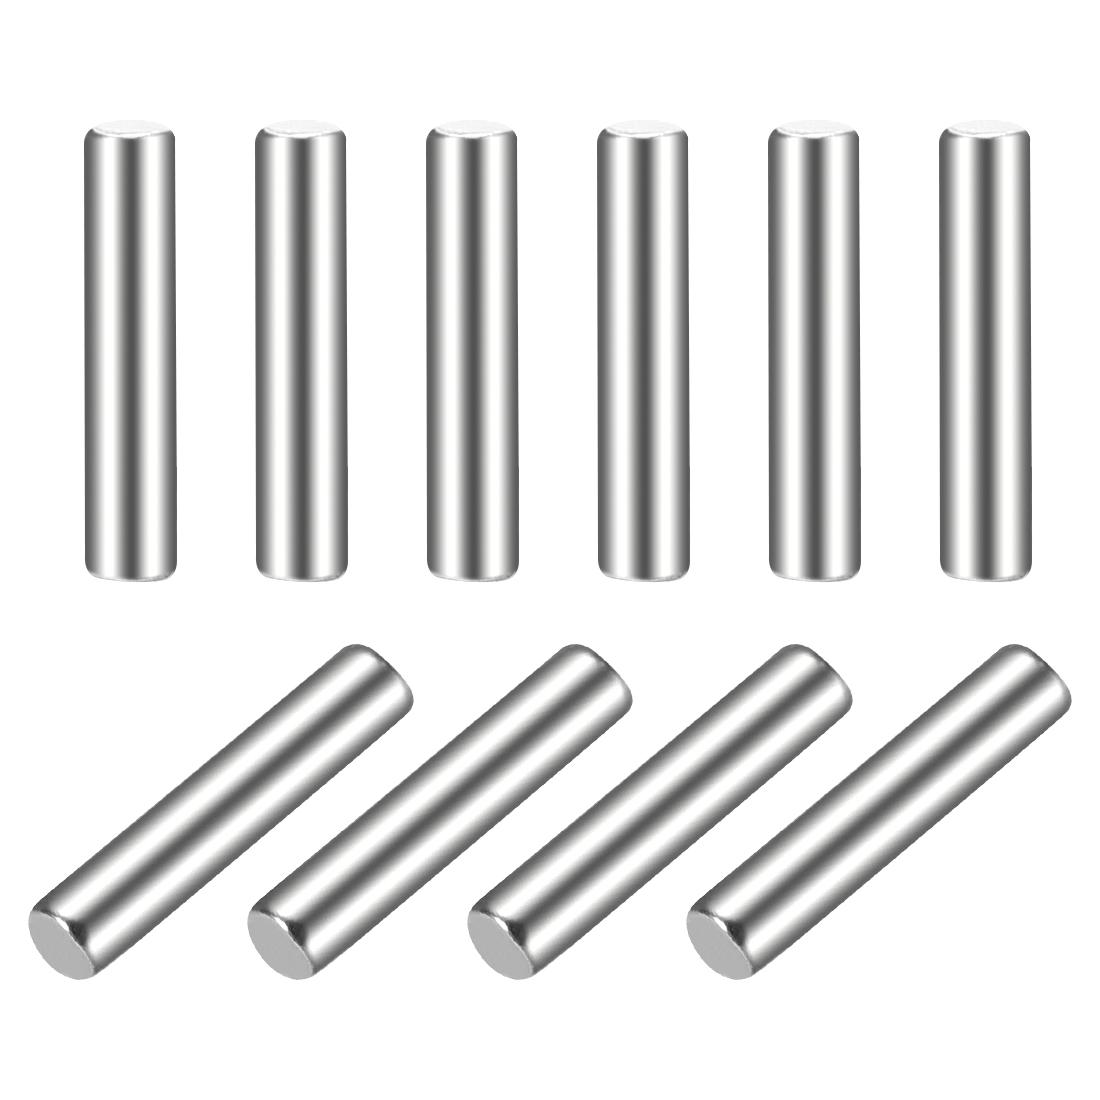 10Pcs 2mm x 10mm Dowel Pin 304 Stainless Steel Shelf Support Pin Fasten